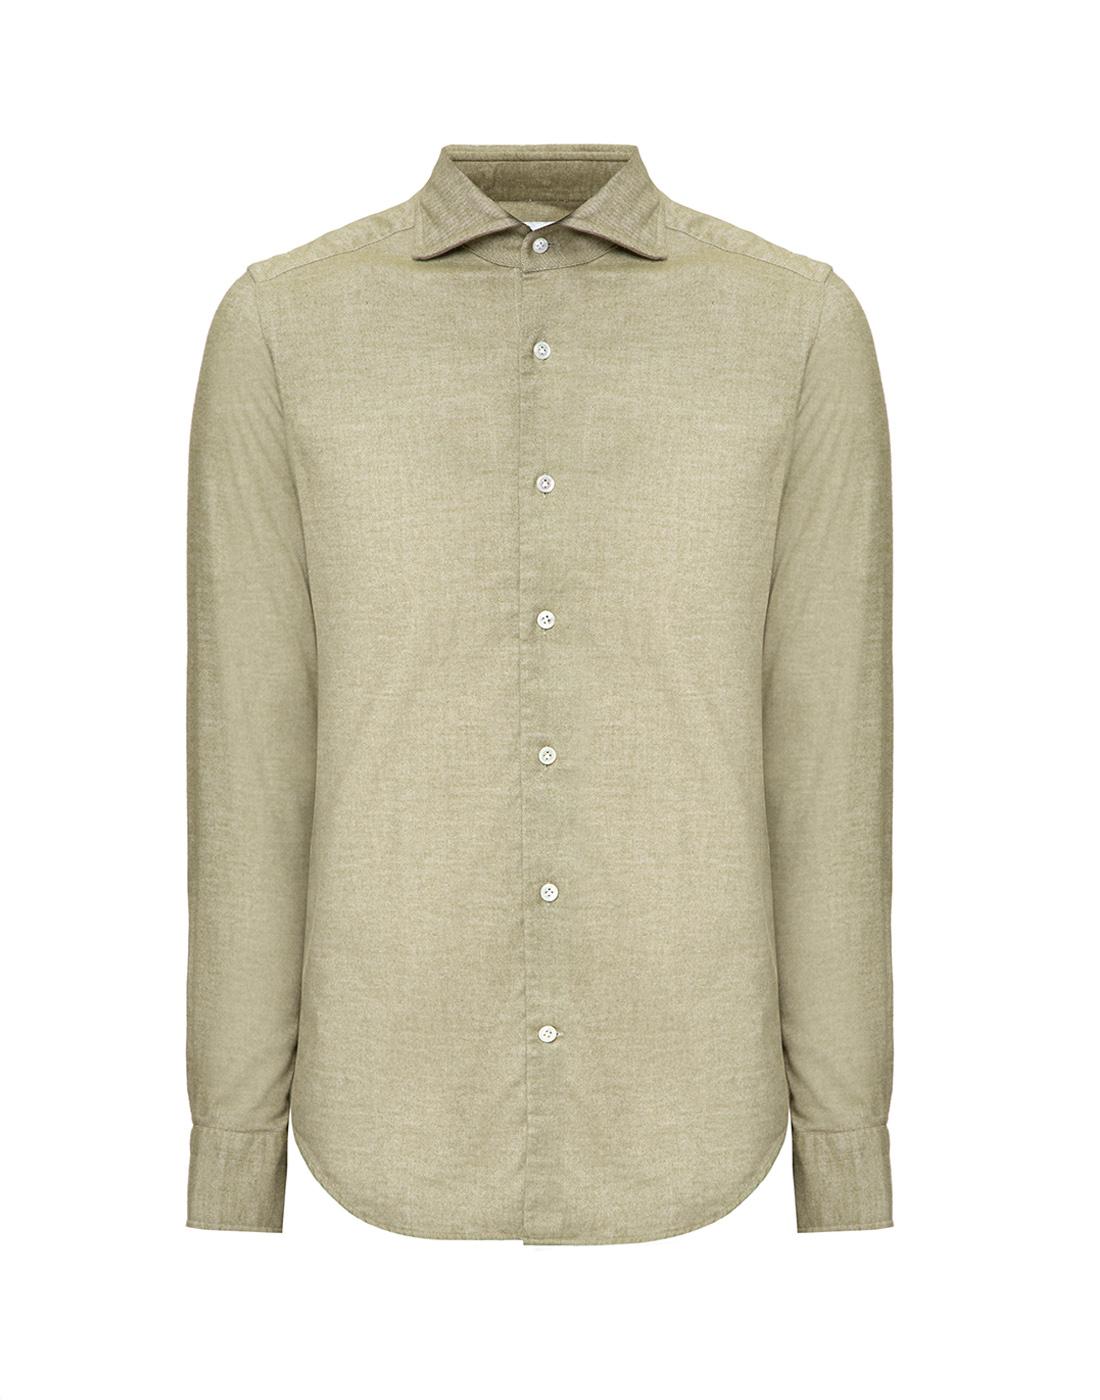 Мужская рубашка оливкового цвета Bagutta S08408.060-1